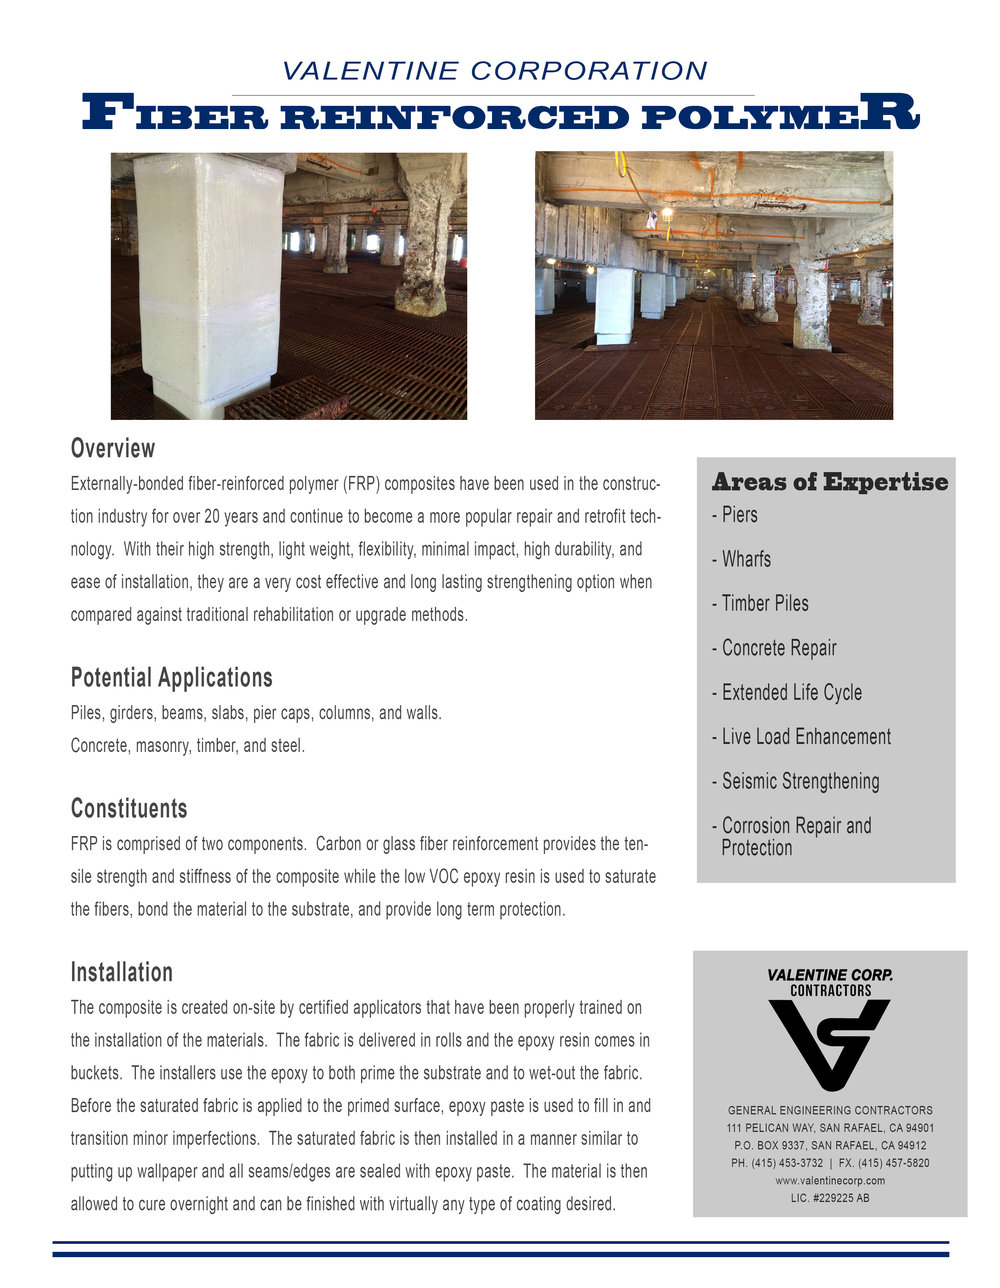 Valentine Corporation - Fiber Reinforced Polymer Information